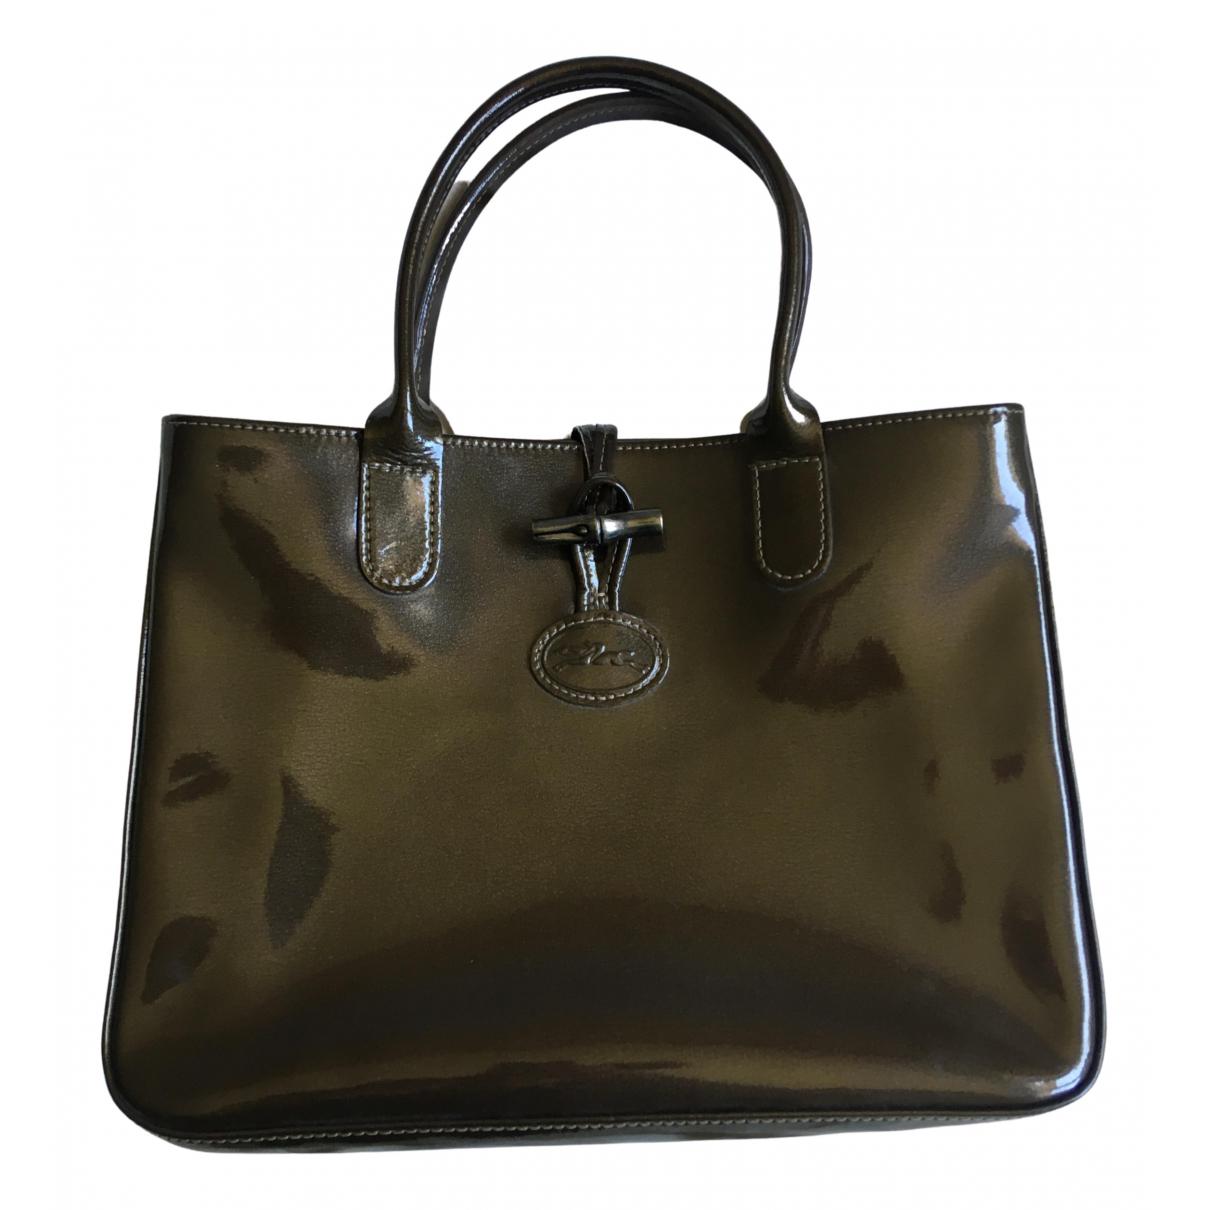 Longchamp - Sac a main Roseau pour femme en cuir verni - kaki